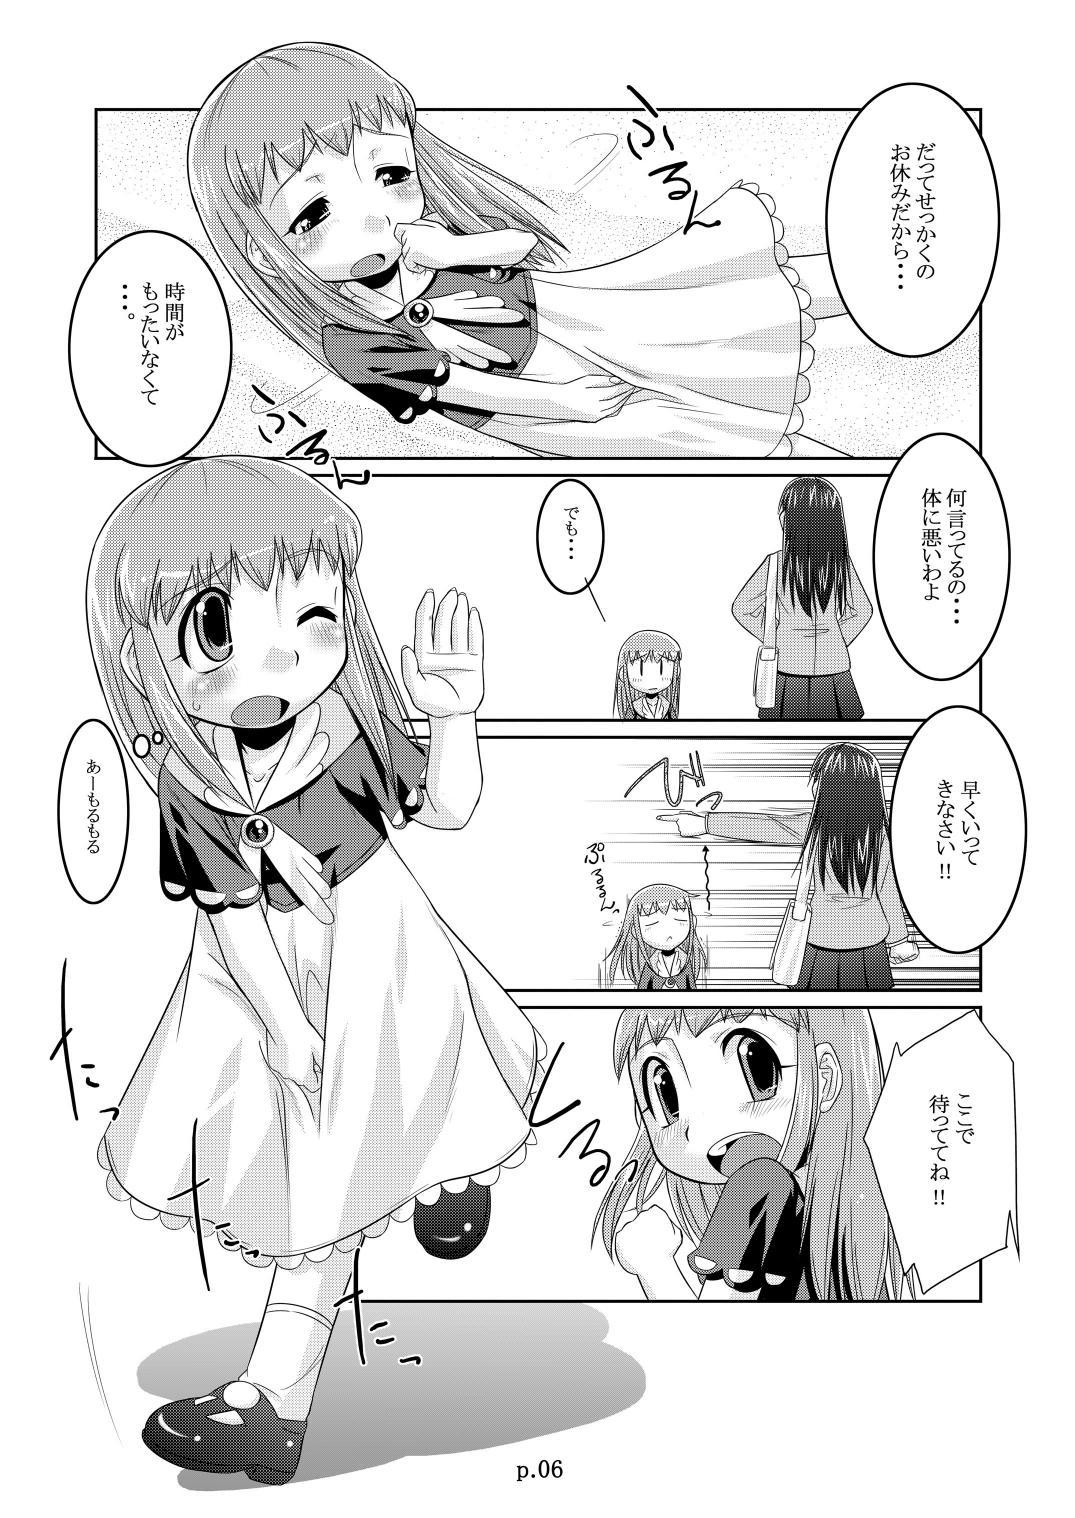 [gyara cter (bee)] Tio hon+ (Konjiki no Gash!! [Zatch Bell!]) dl version 5